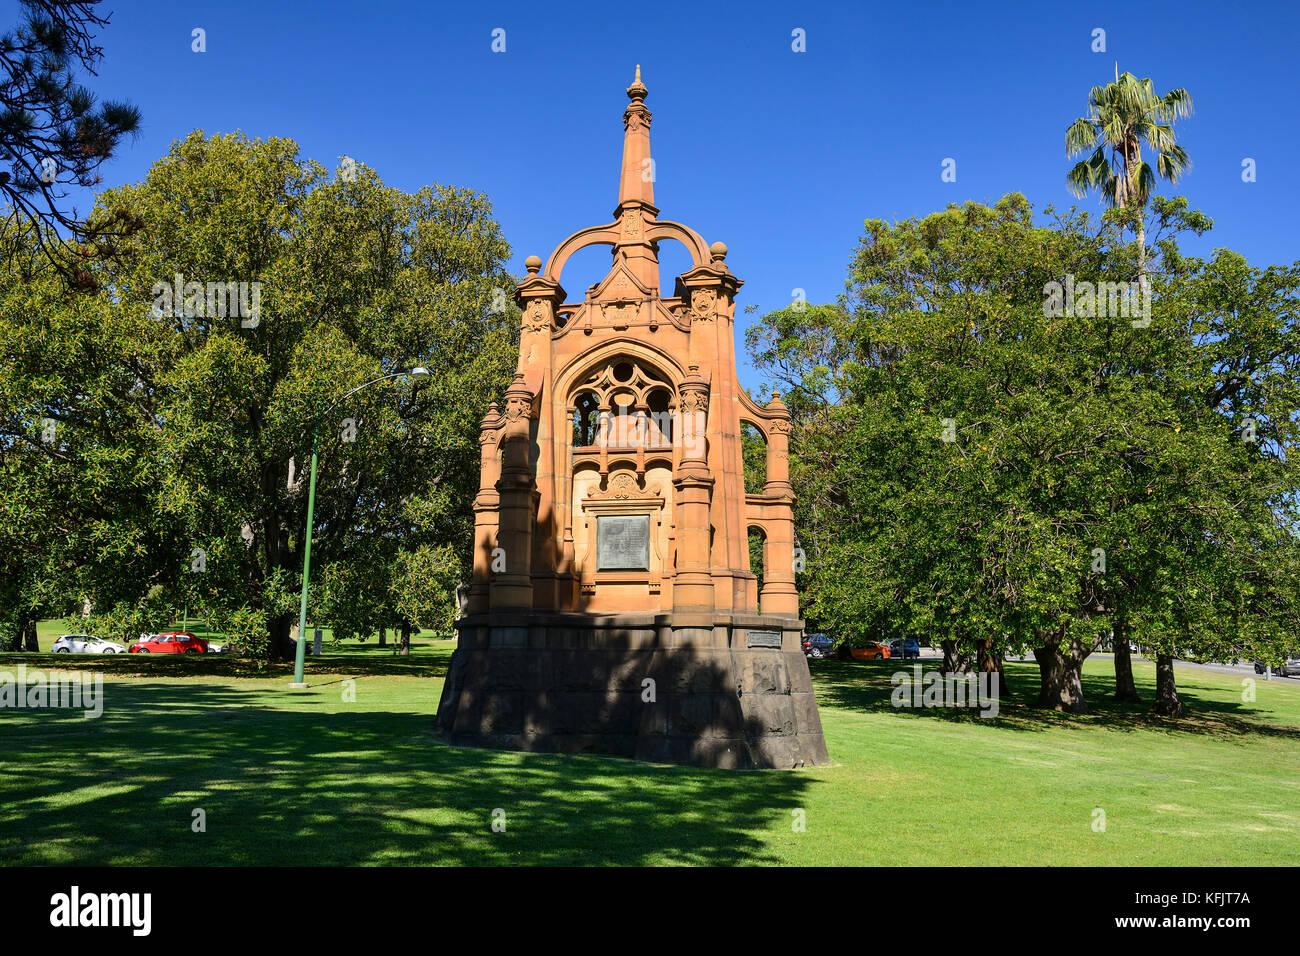 Boer War Memorial within the King's Domain Park in Melbourne, Victoria, Australia - Stock Image